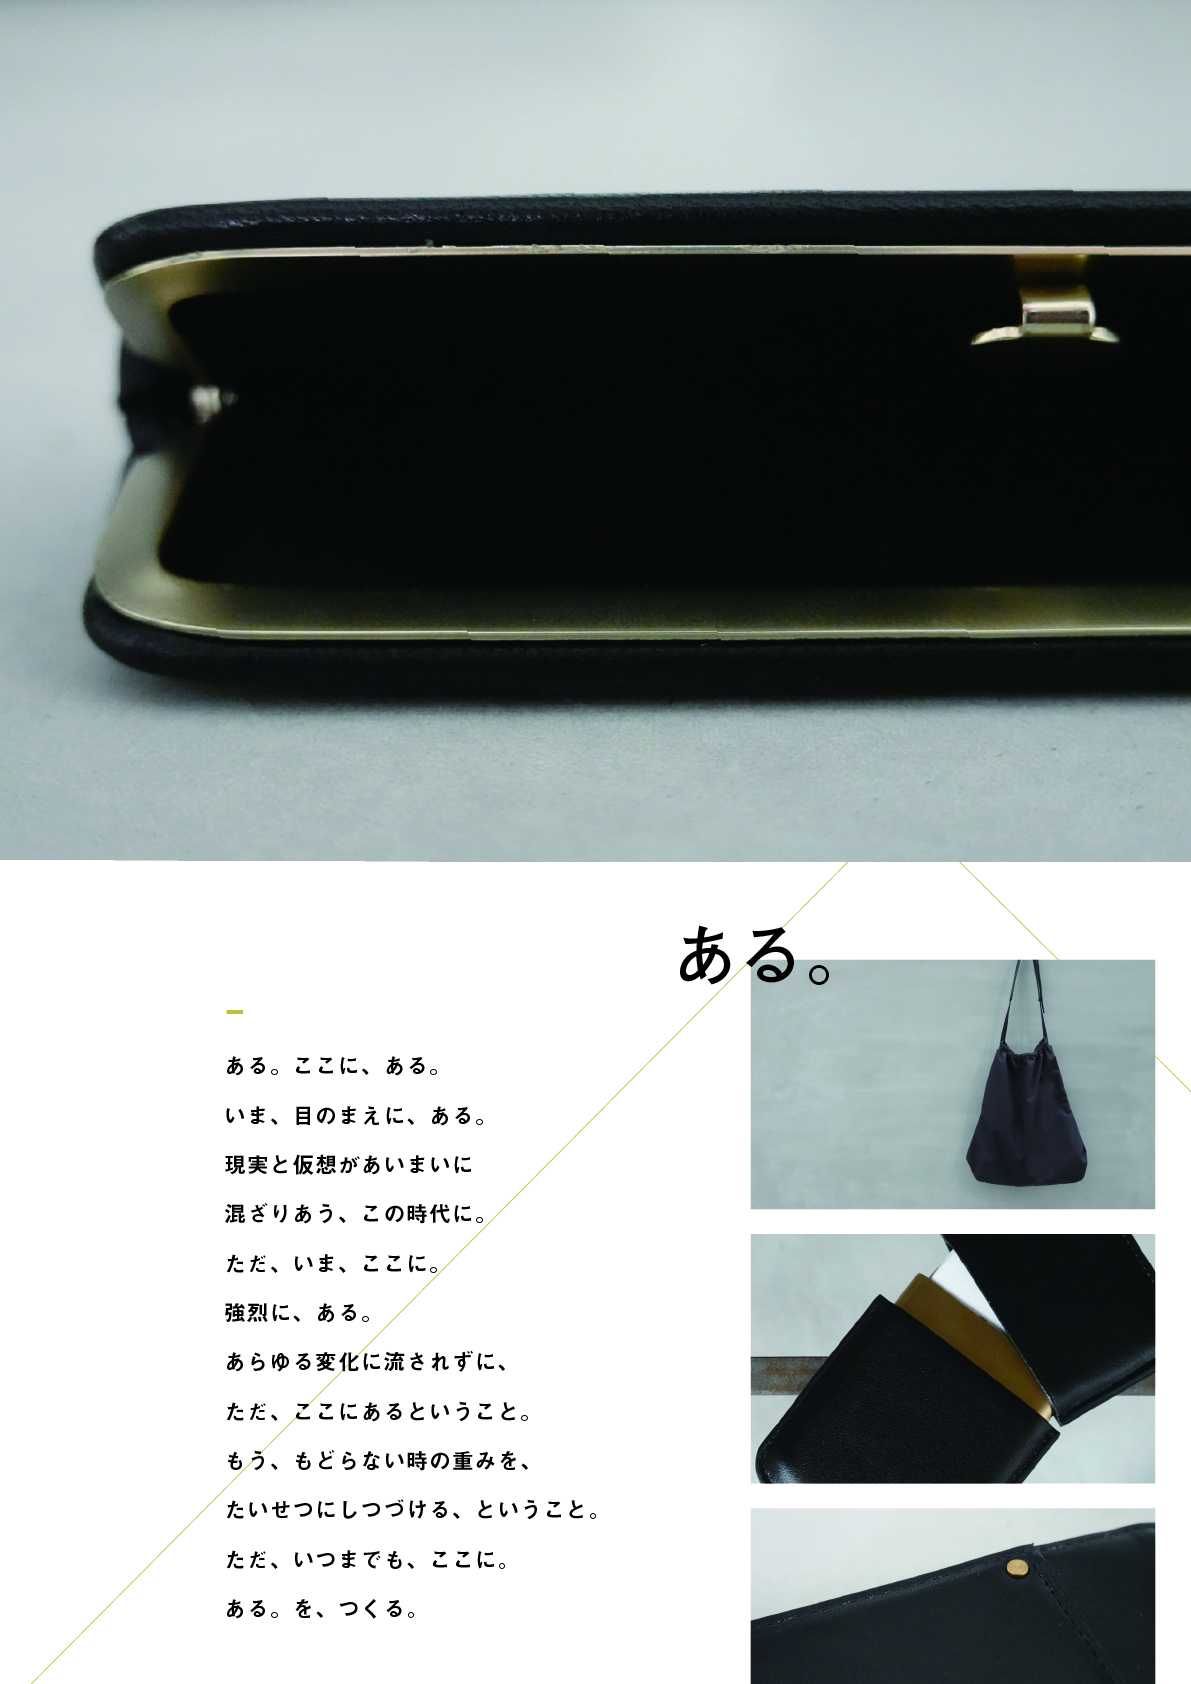 松村力弥,Rikiya Matsumura,texnh,展示会,EXHIBITION